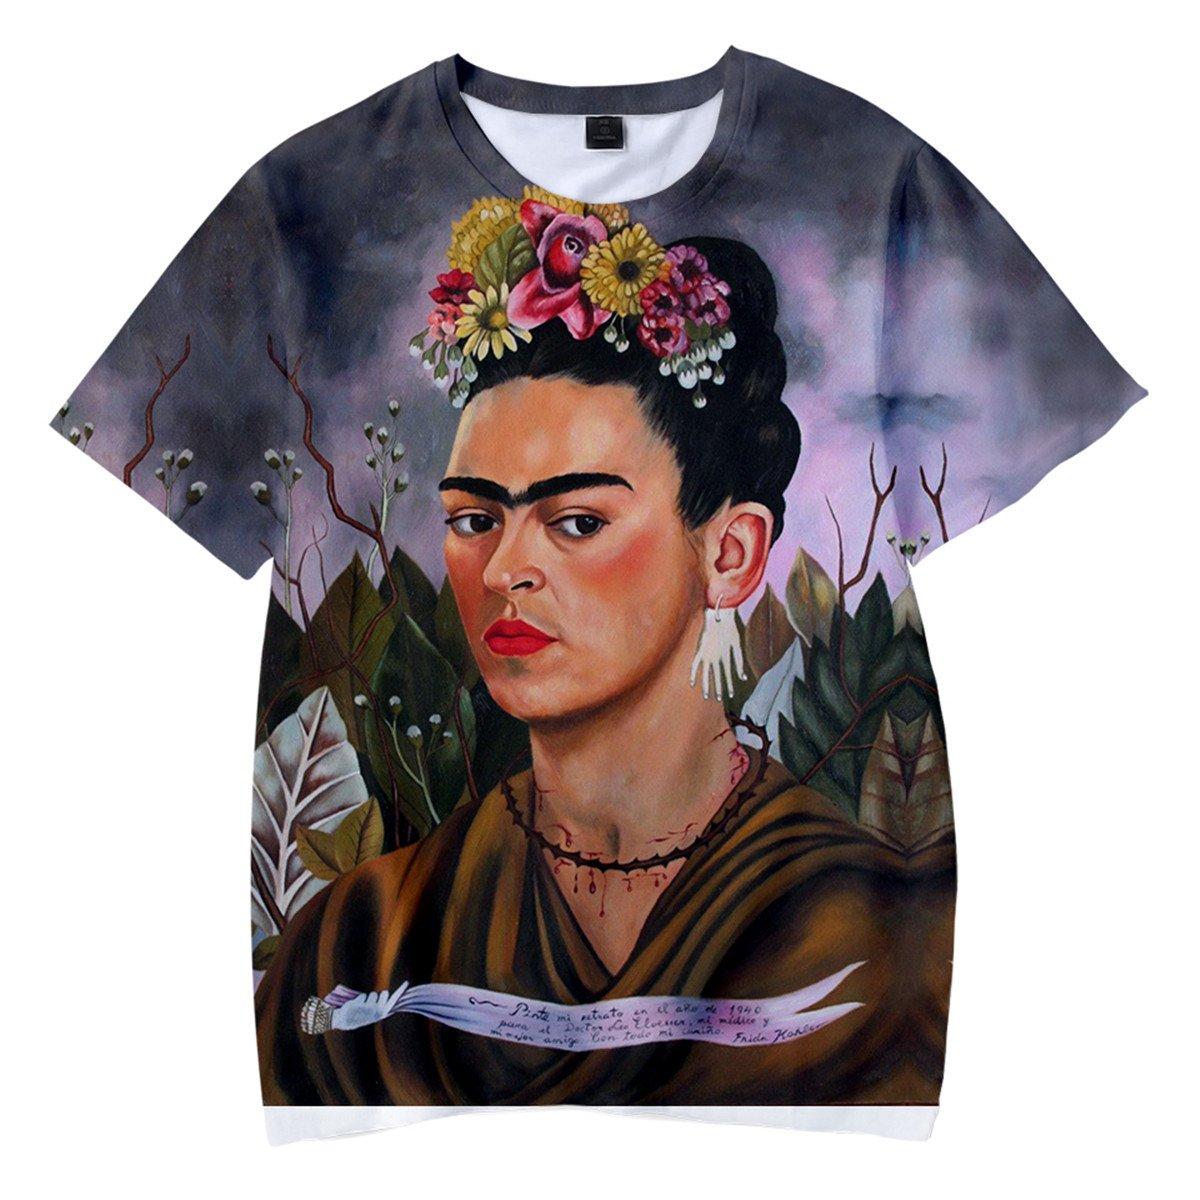 SIMYJOY Unisex Frida Kahlo Poster T-Shirt 3D Stampa T-Shirt Artist Messicana Vintage Style Cool Modern Rockabilly Summer Streetwear Tee per Uomo Donna Giovani PSIMQ1022-TX-W